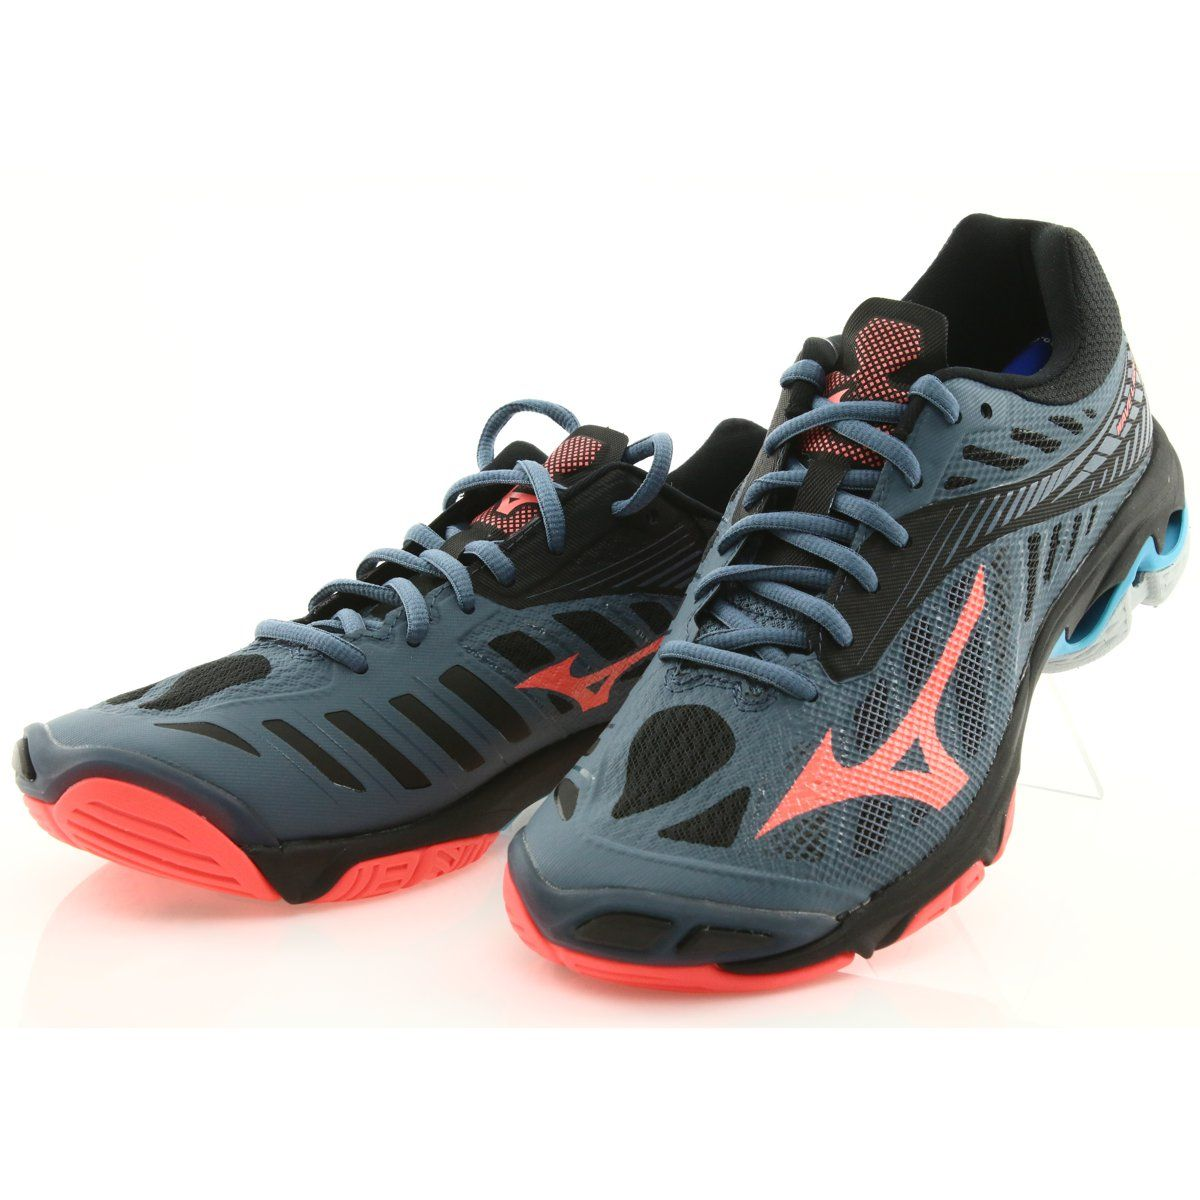 Buty Do Siatkowki Mizuno Wave Lighting Z4 W V1gc180065 Szare Mizuno Shoes Sneakers